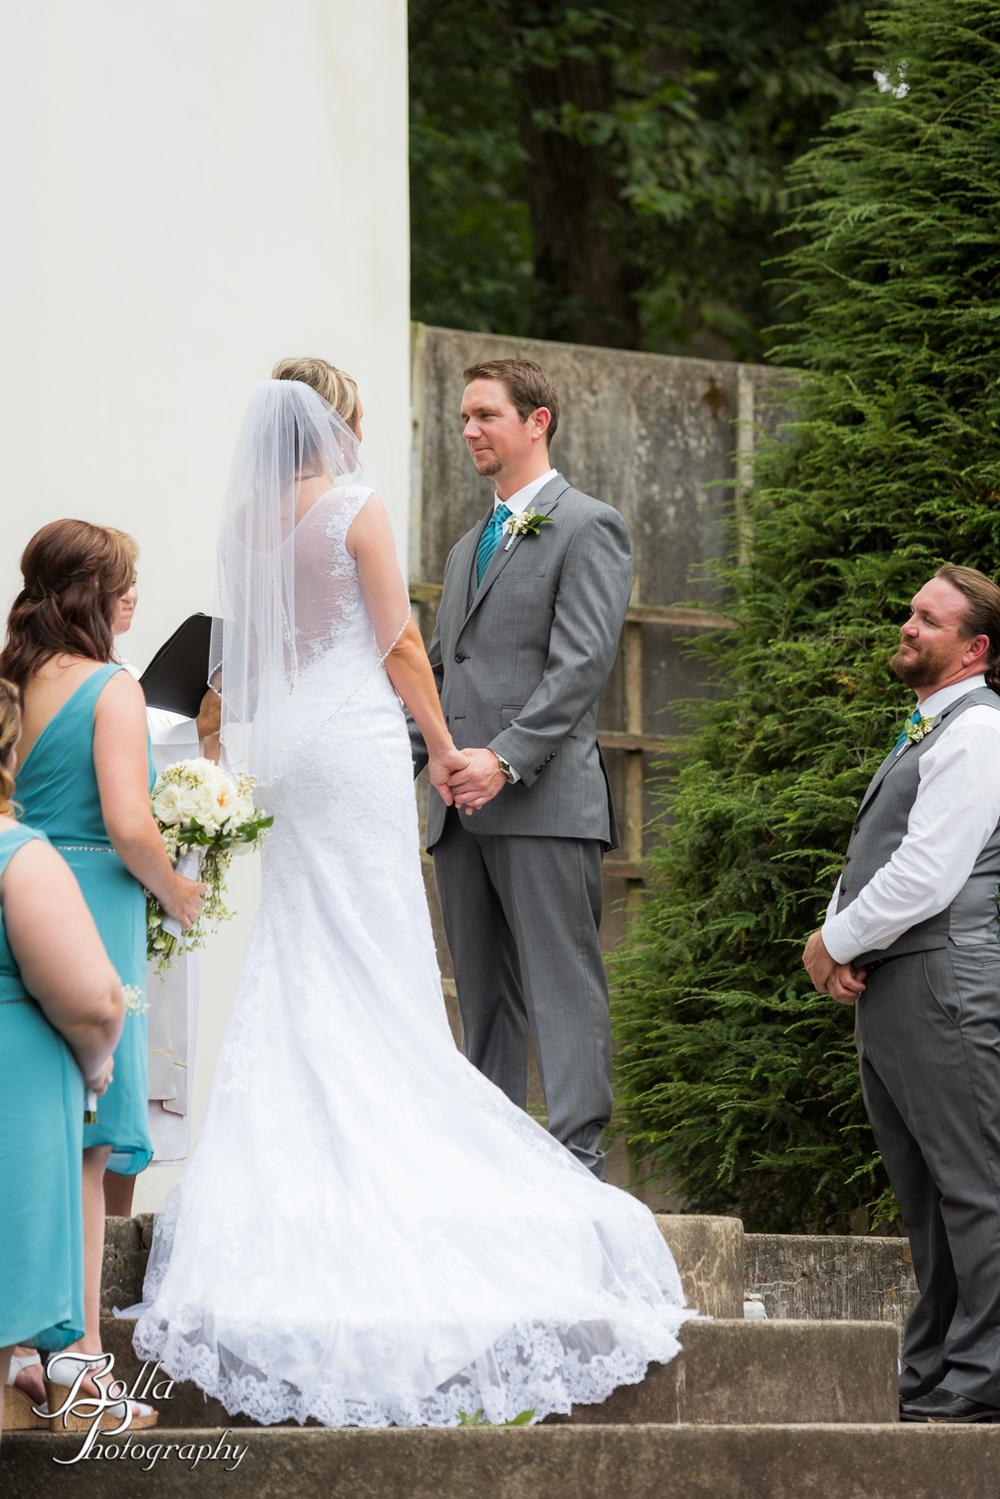 Bolla_Photography_St_Louis_wedding_photographer-0253.jpg